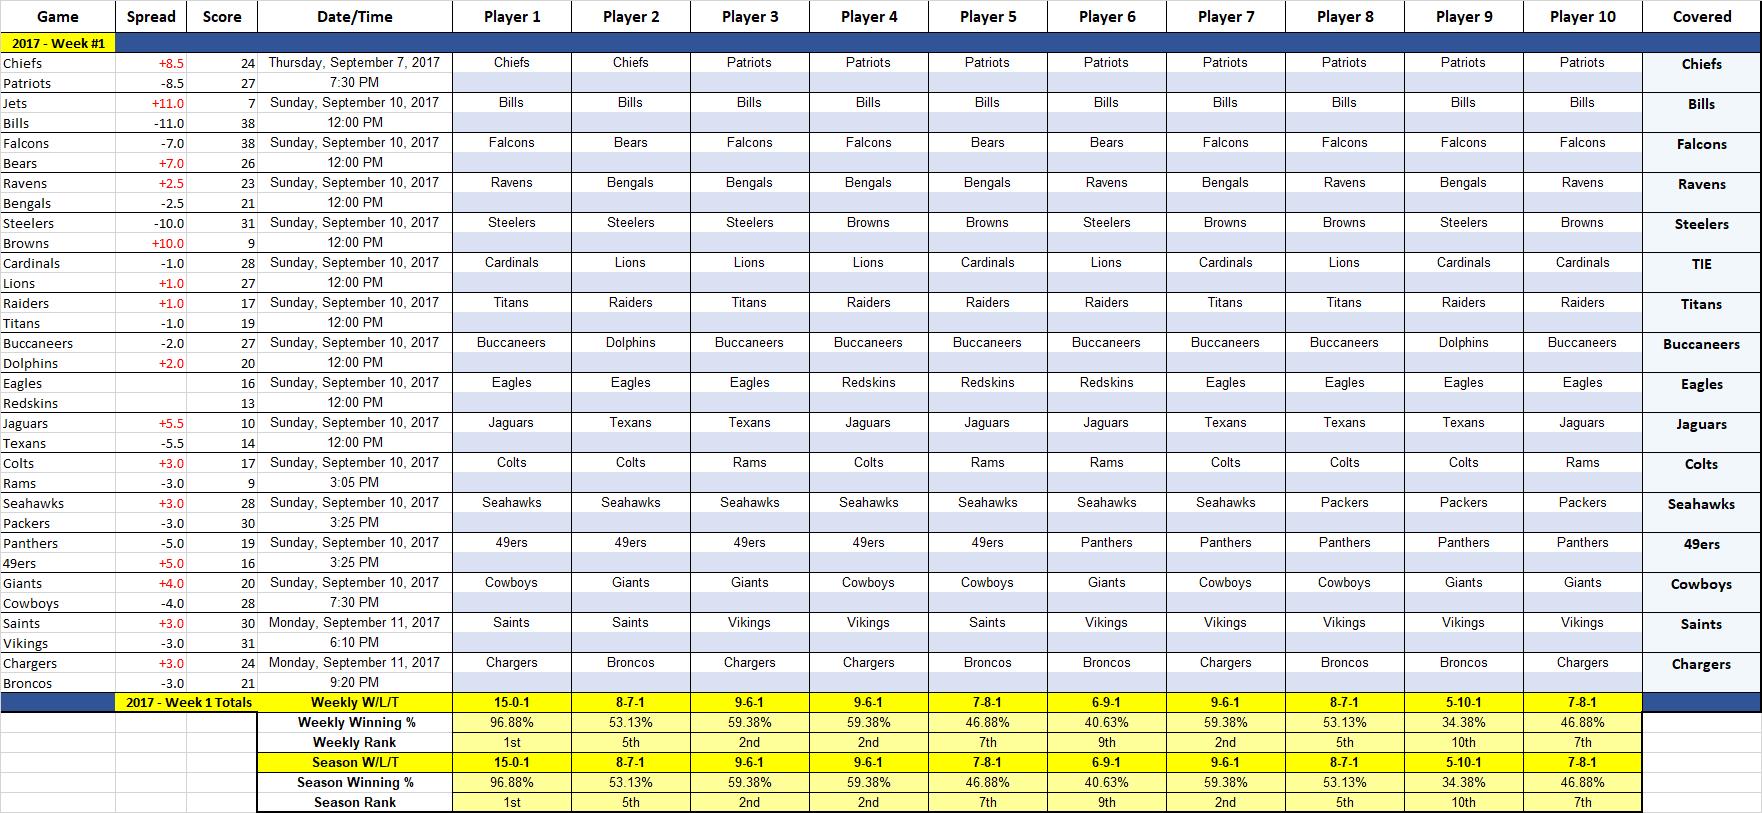 Personal 2017 Nfl Weekly Schedule Excel Spreadsheet Throughout 2017 Nfl Weekly Schedule Excel Spreadsheet Free Download